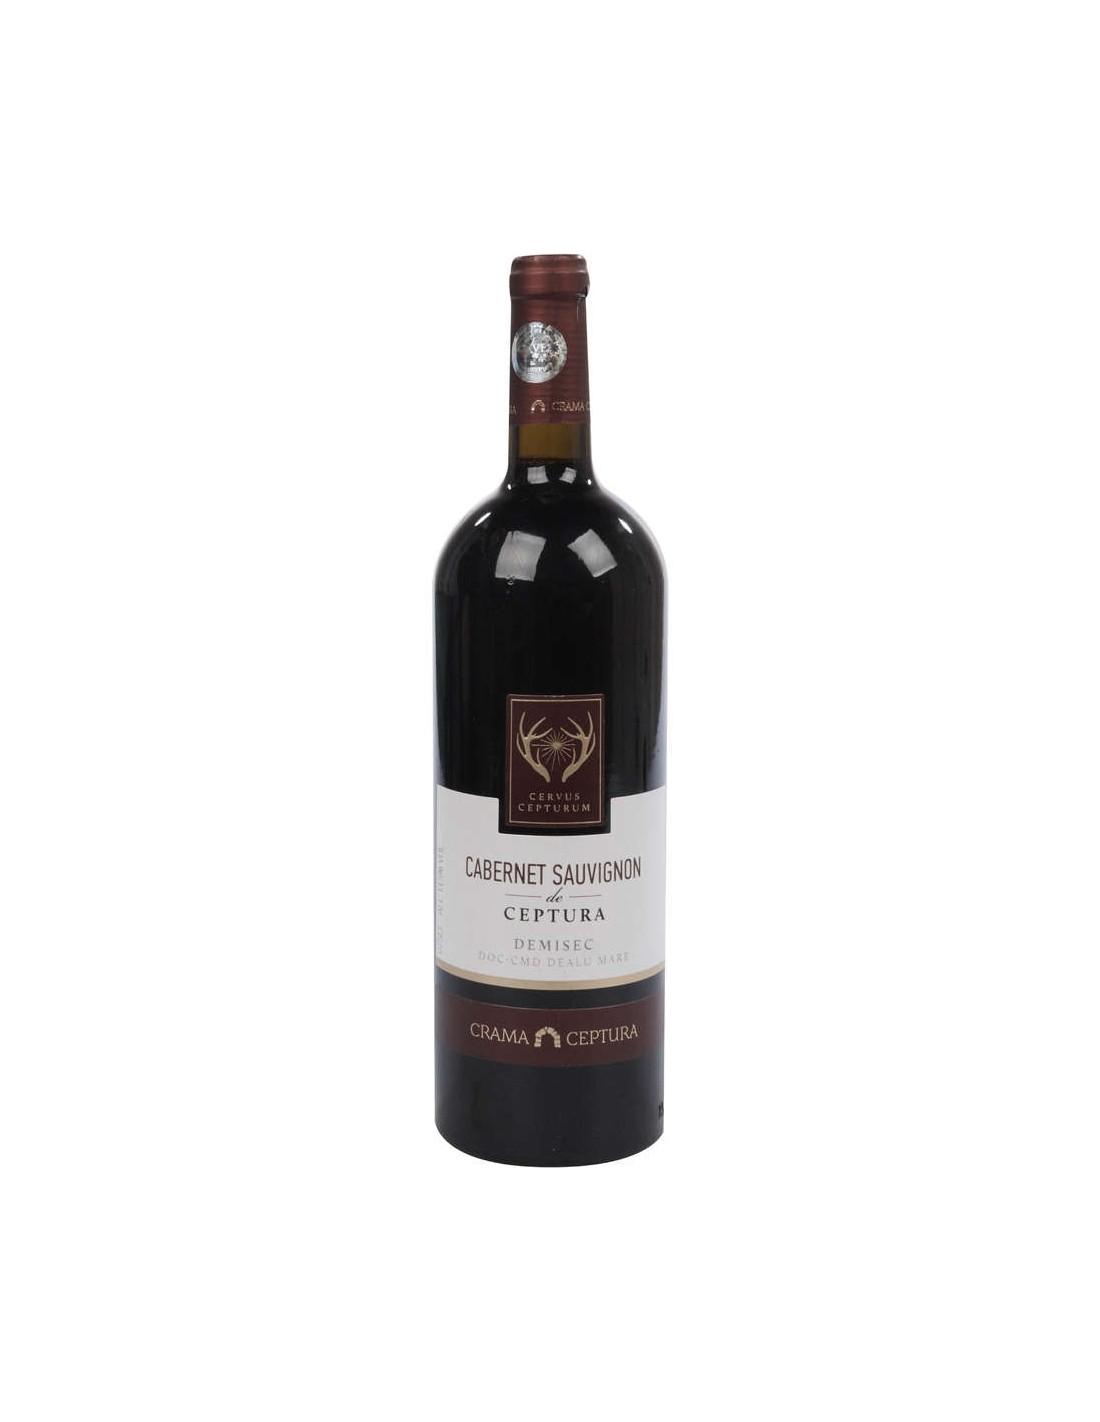 Vin rosu demisec, Cabernet Sauvignon, Cervus Cepturum Dealul Mare, 0.75L, 13.5% alc., Romania